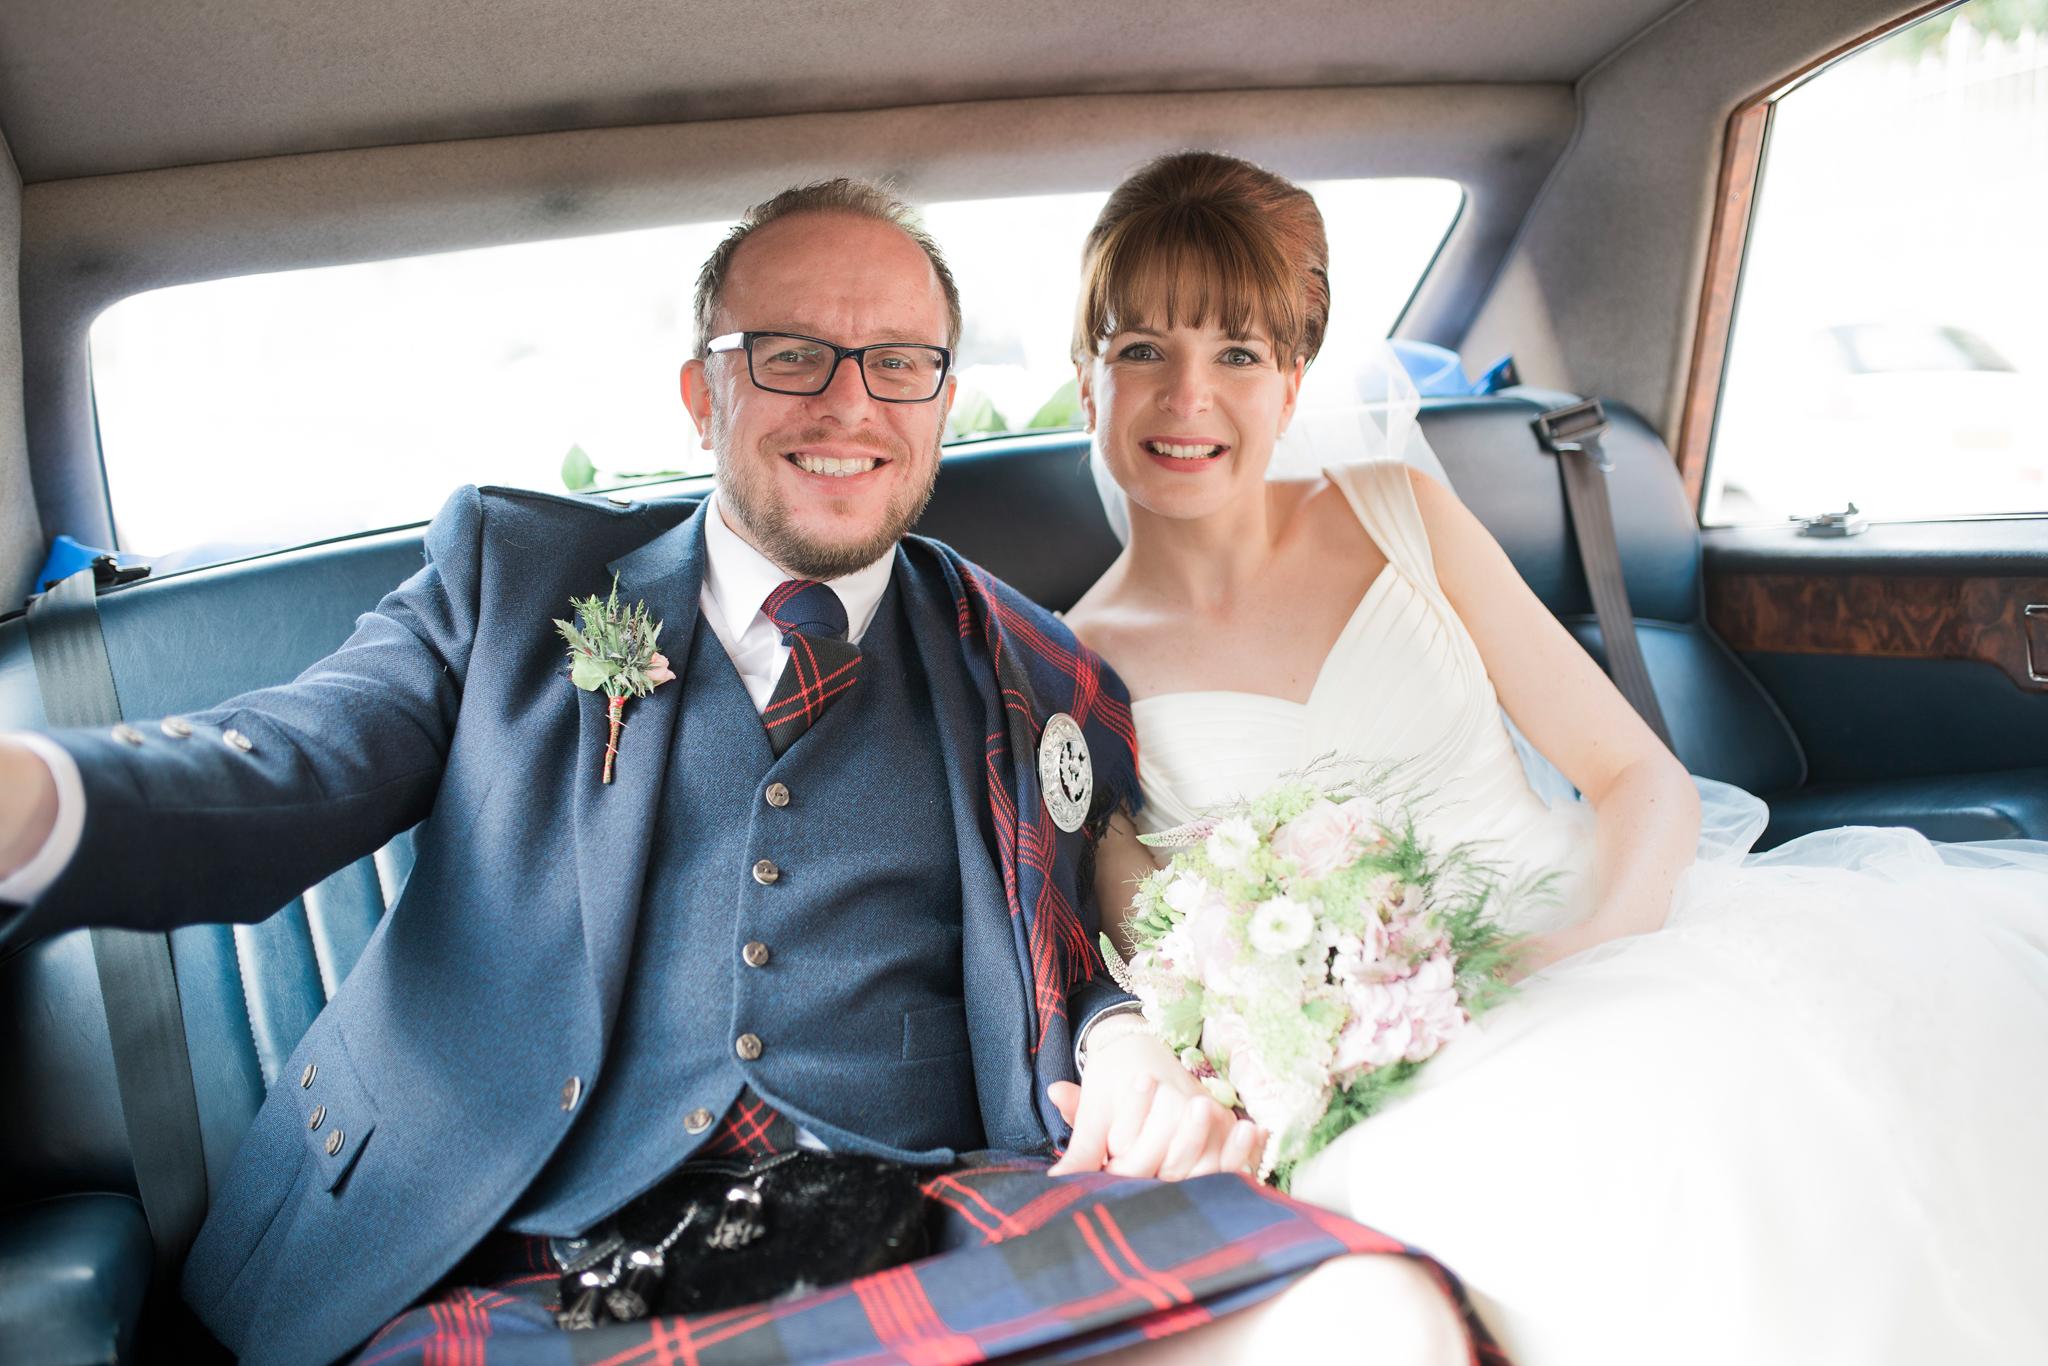 072-scotland-wedding-photographer.jpg